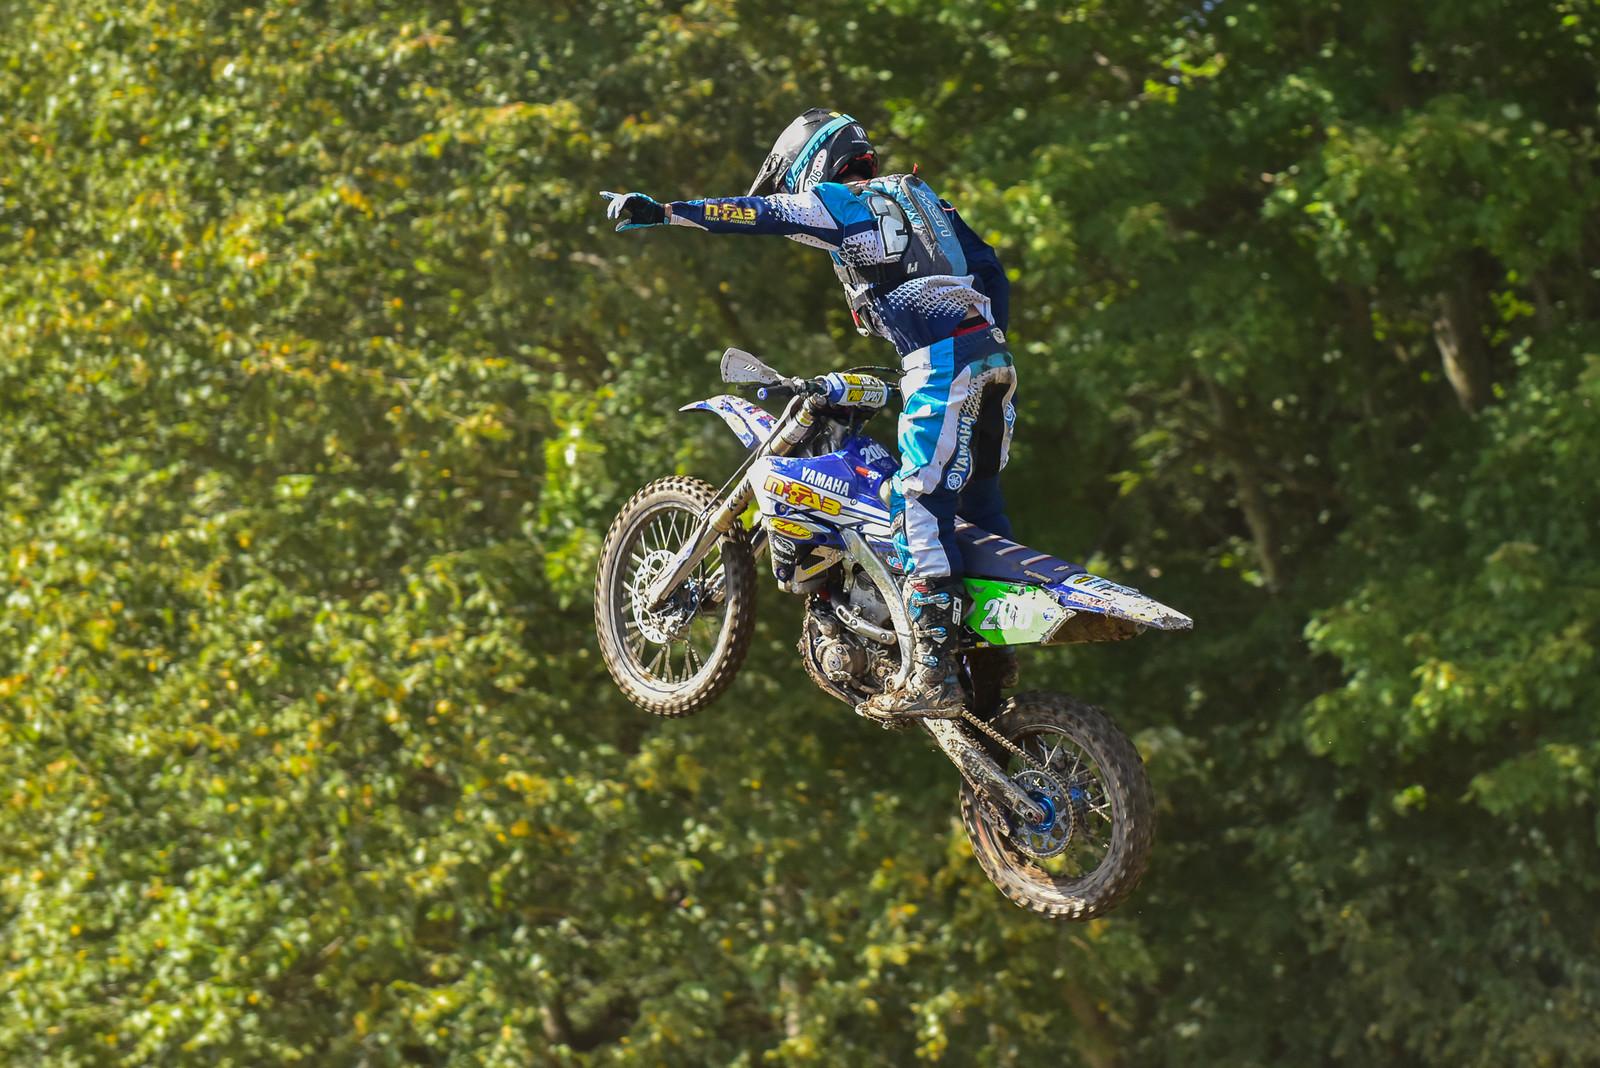 Joshua Toth - Unadilla GNCC - Motocross Pictures - Vital MX